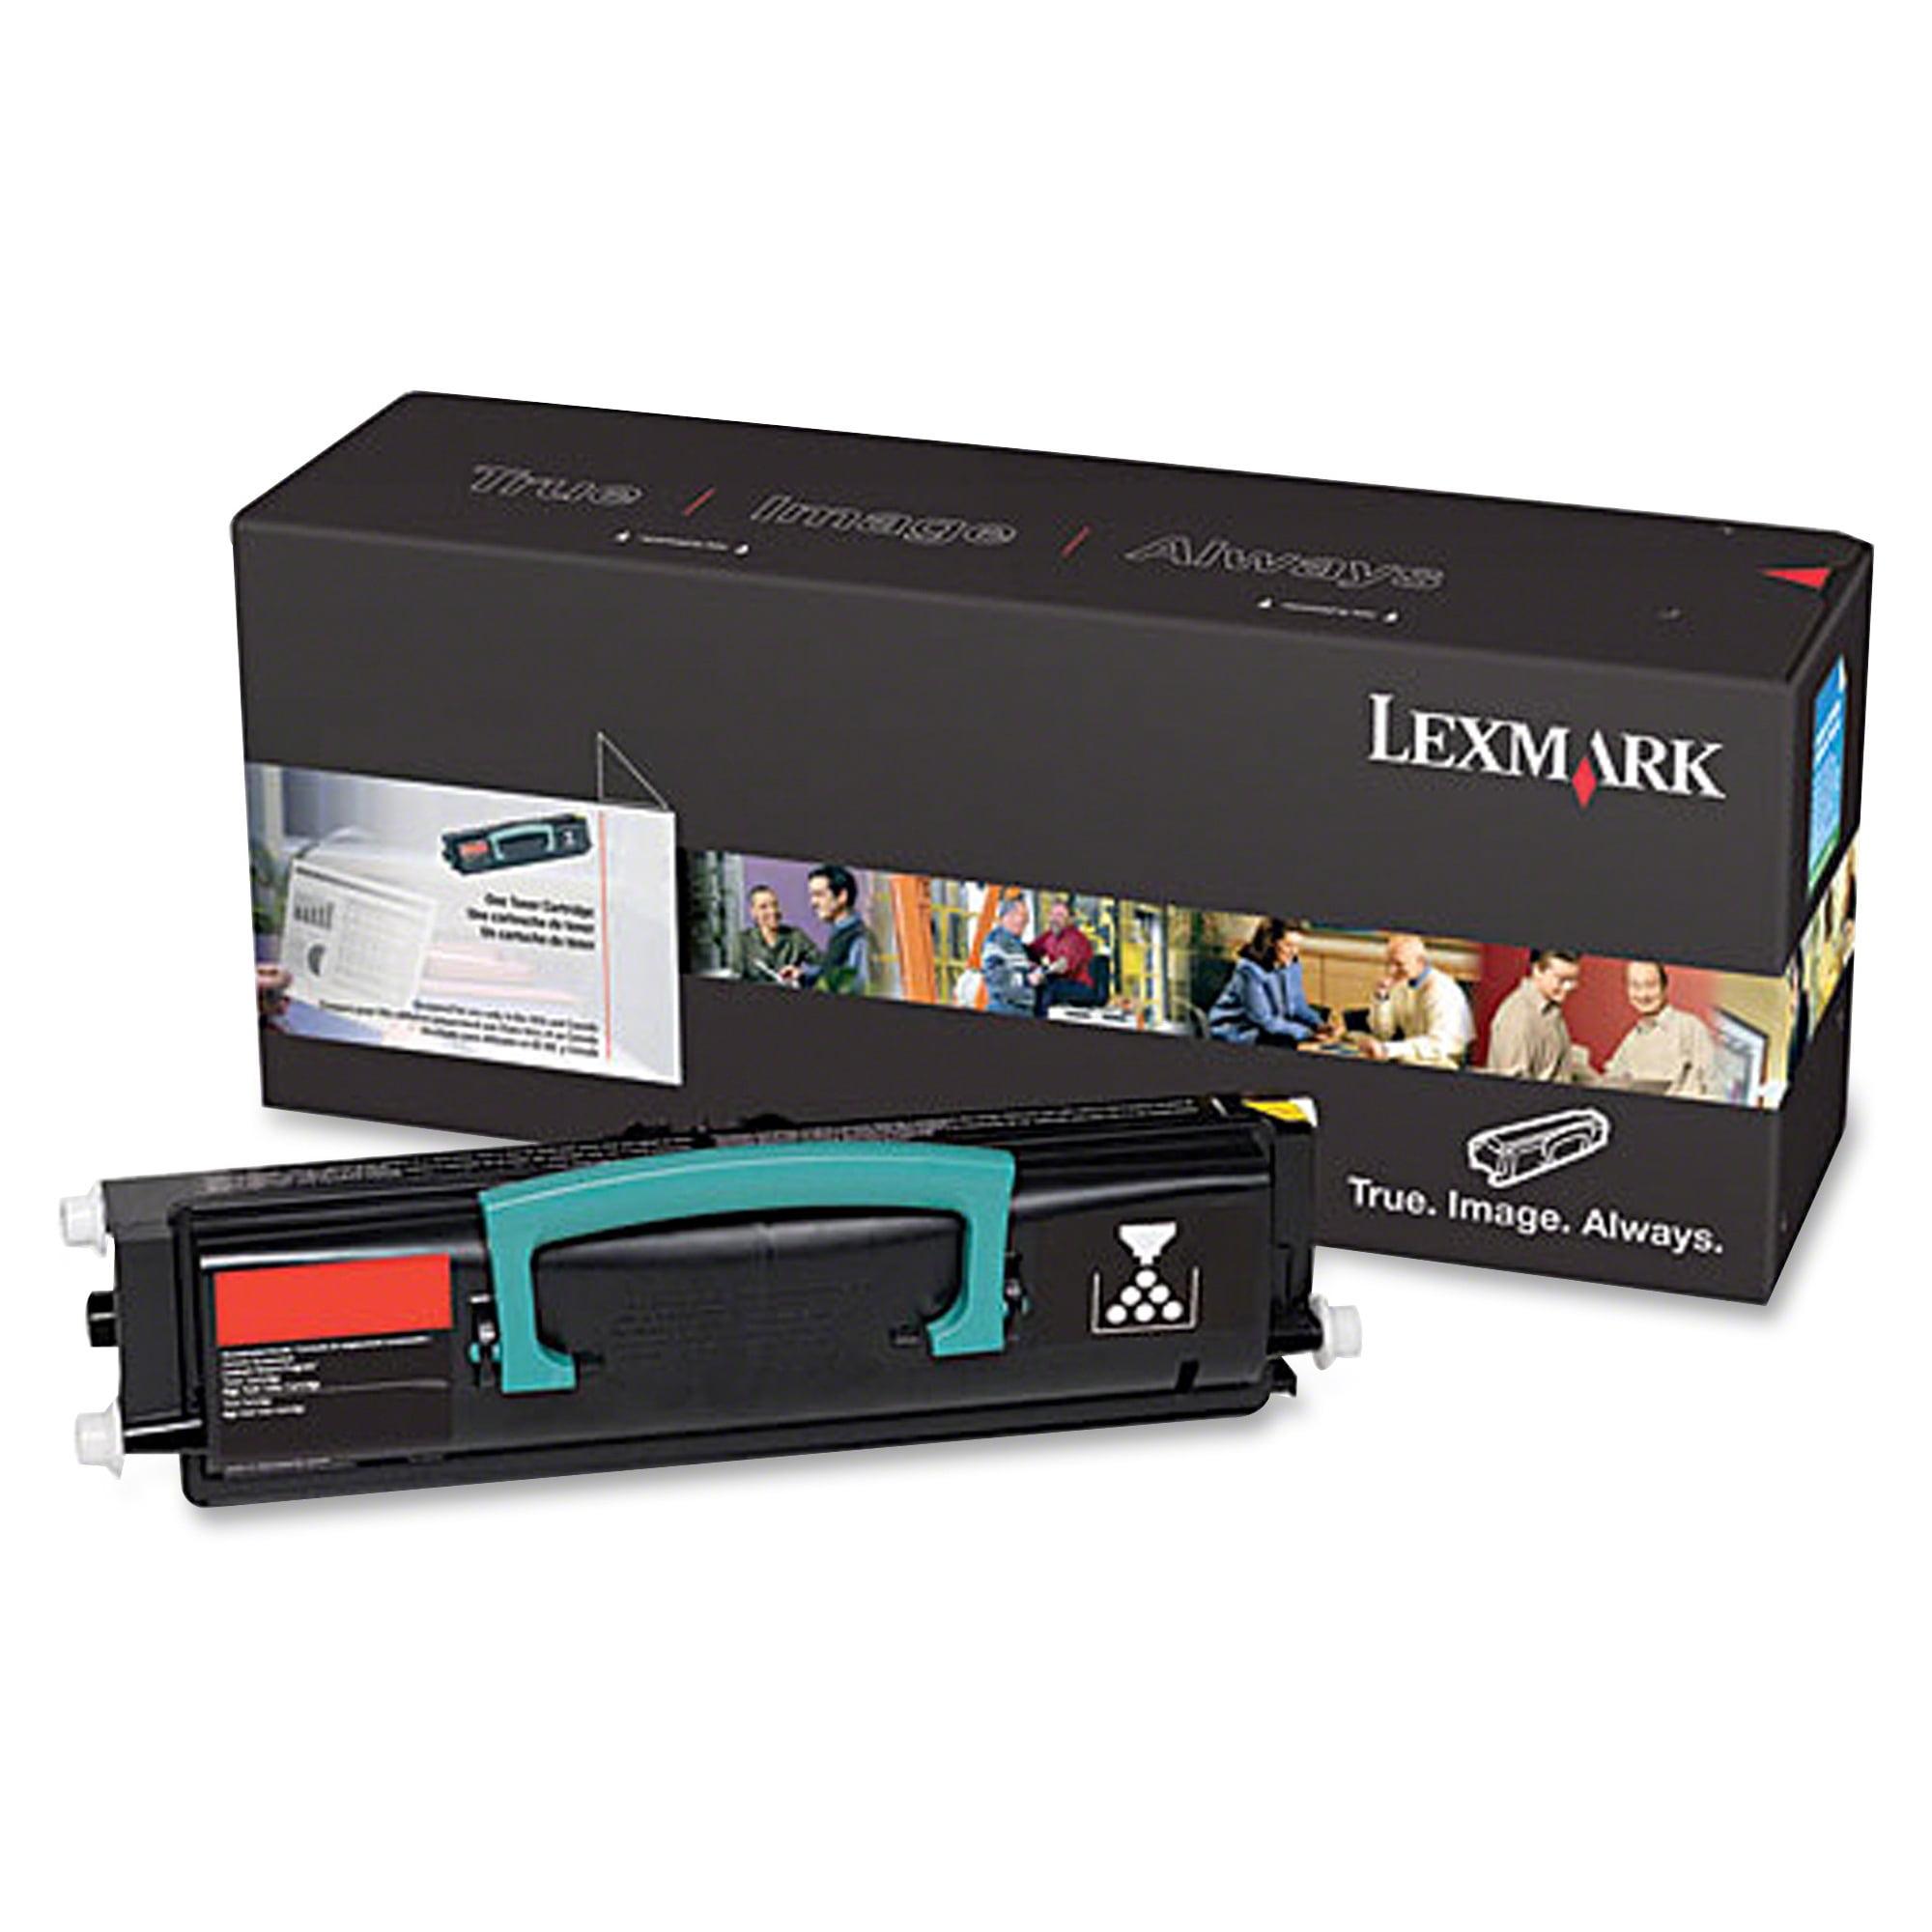 Lexmark - High Yield - black - original - toner cartridge - LRP